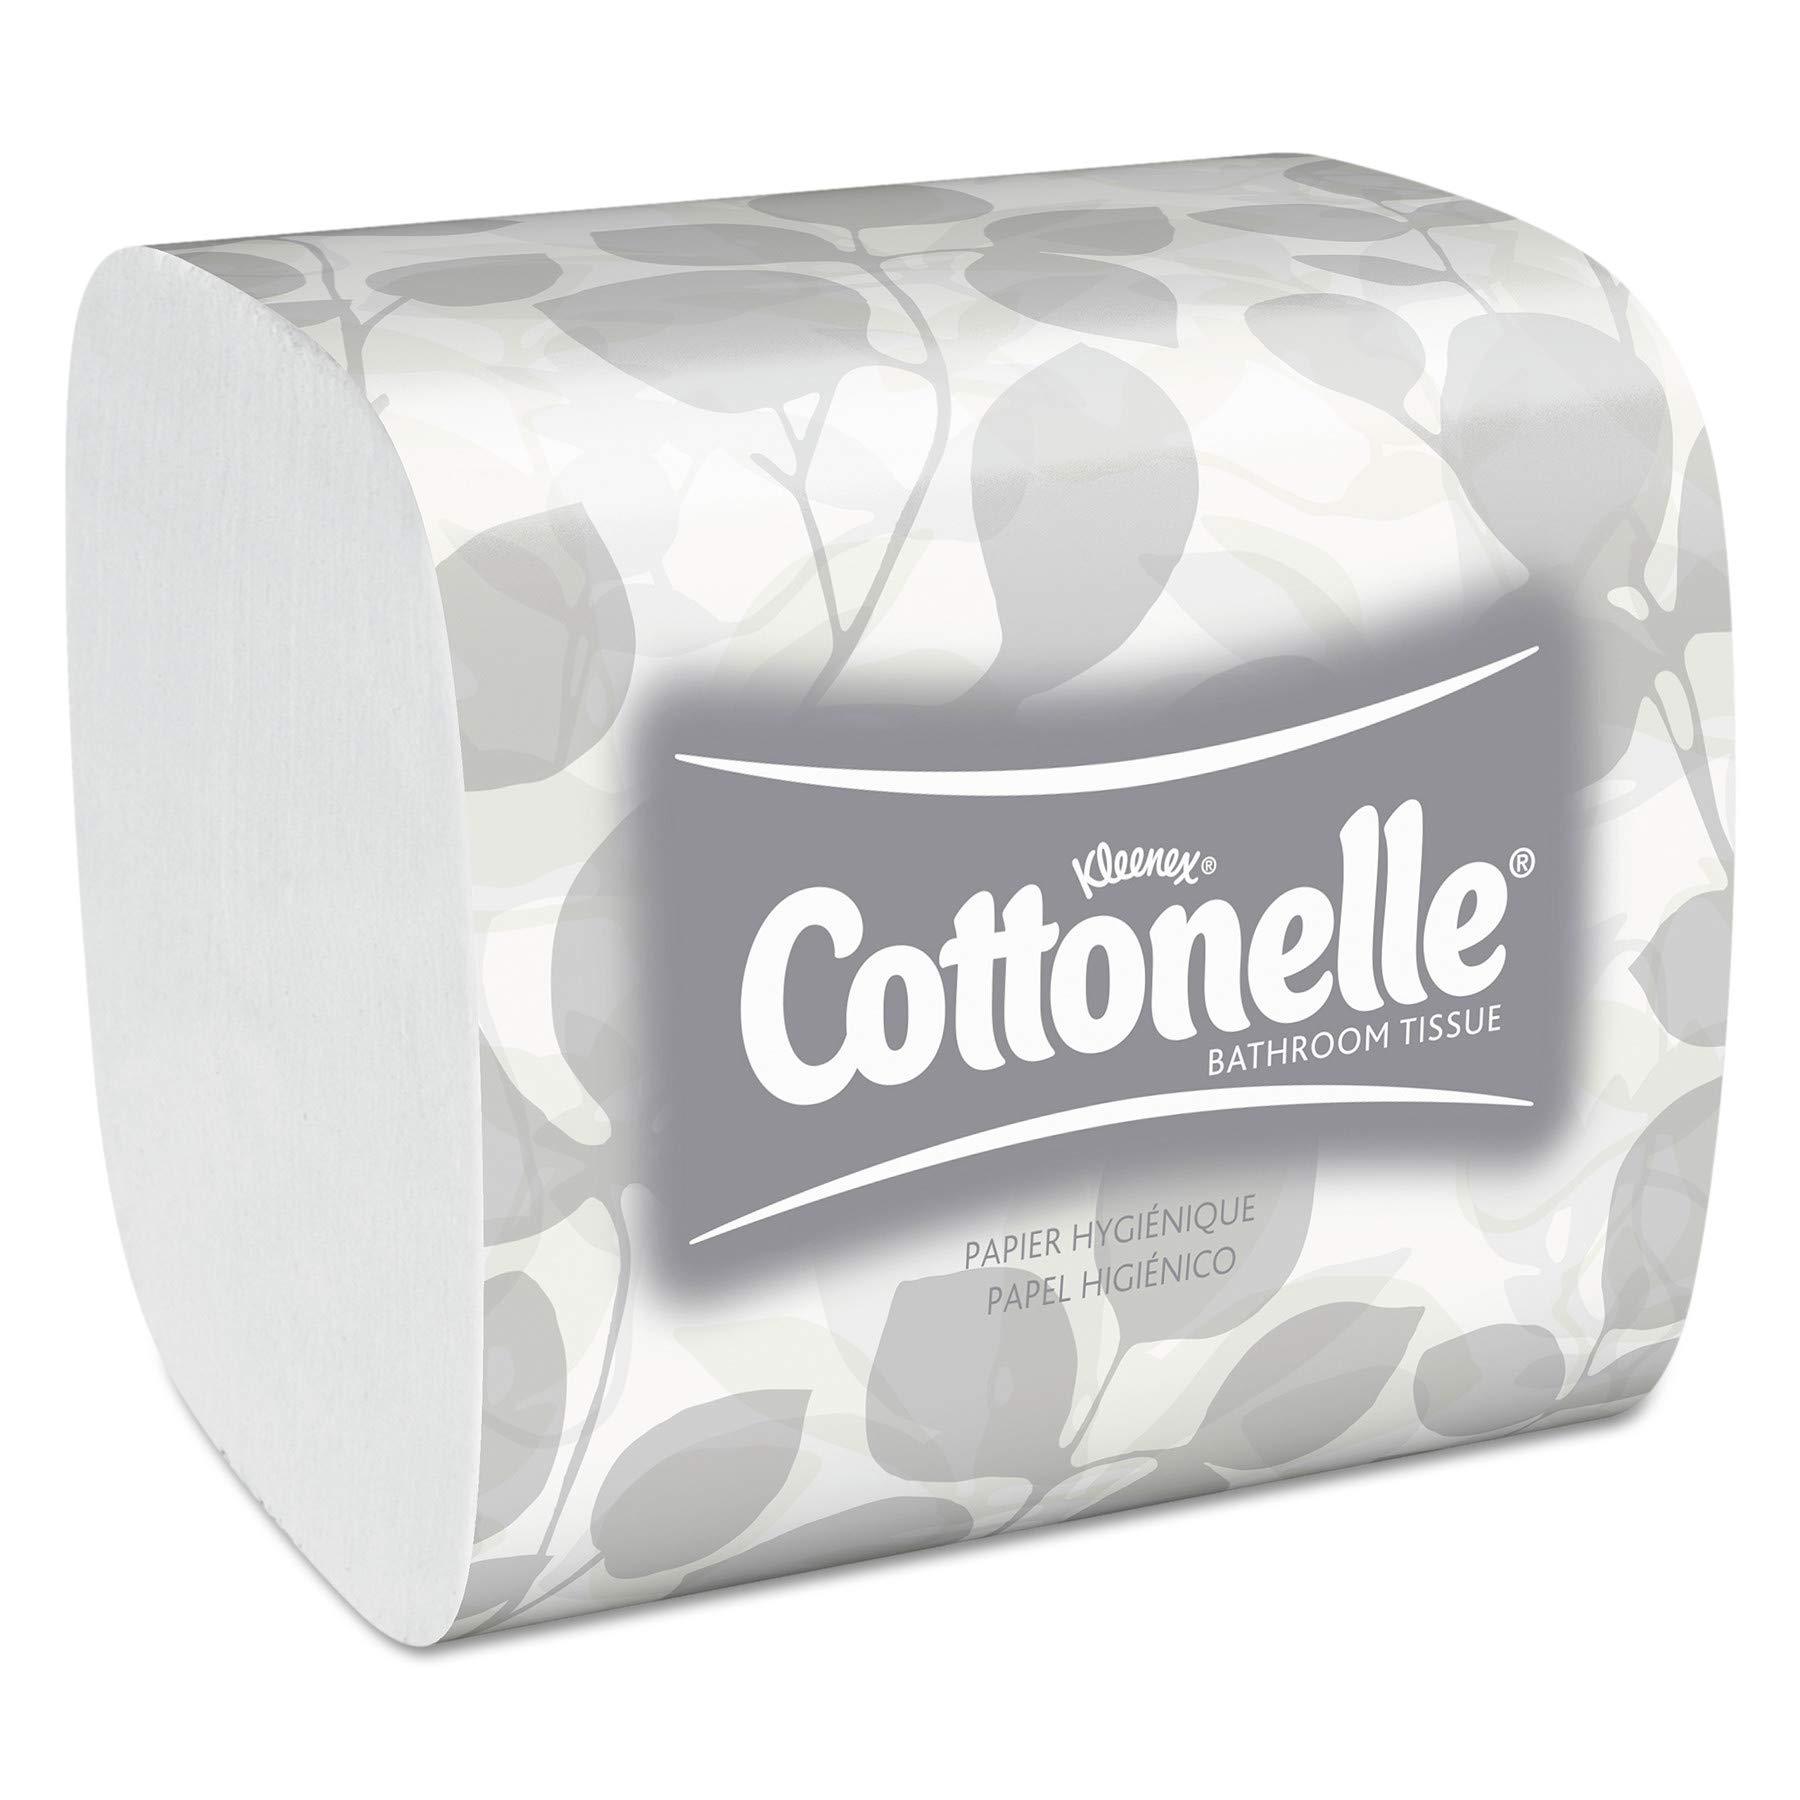 Scott 48280 Control Hygienic Bath Tissue, 2-Ply, 250 per Pack (Case of 36 Packs) by Scott